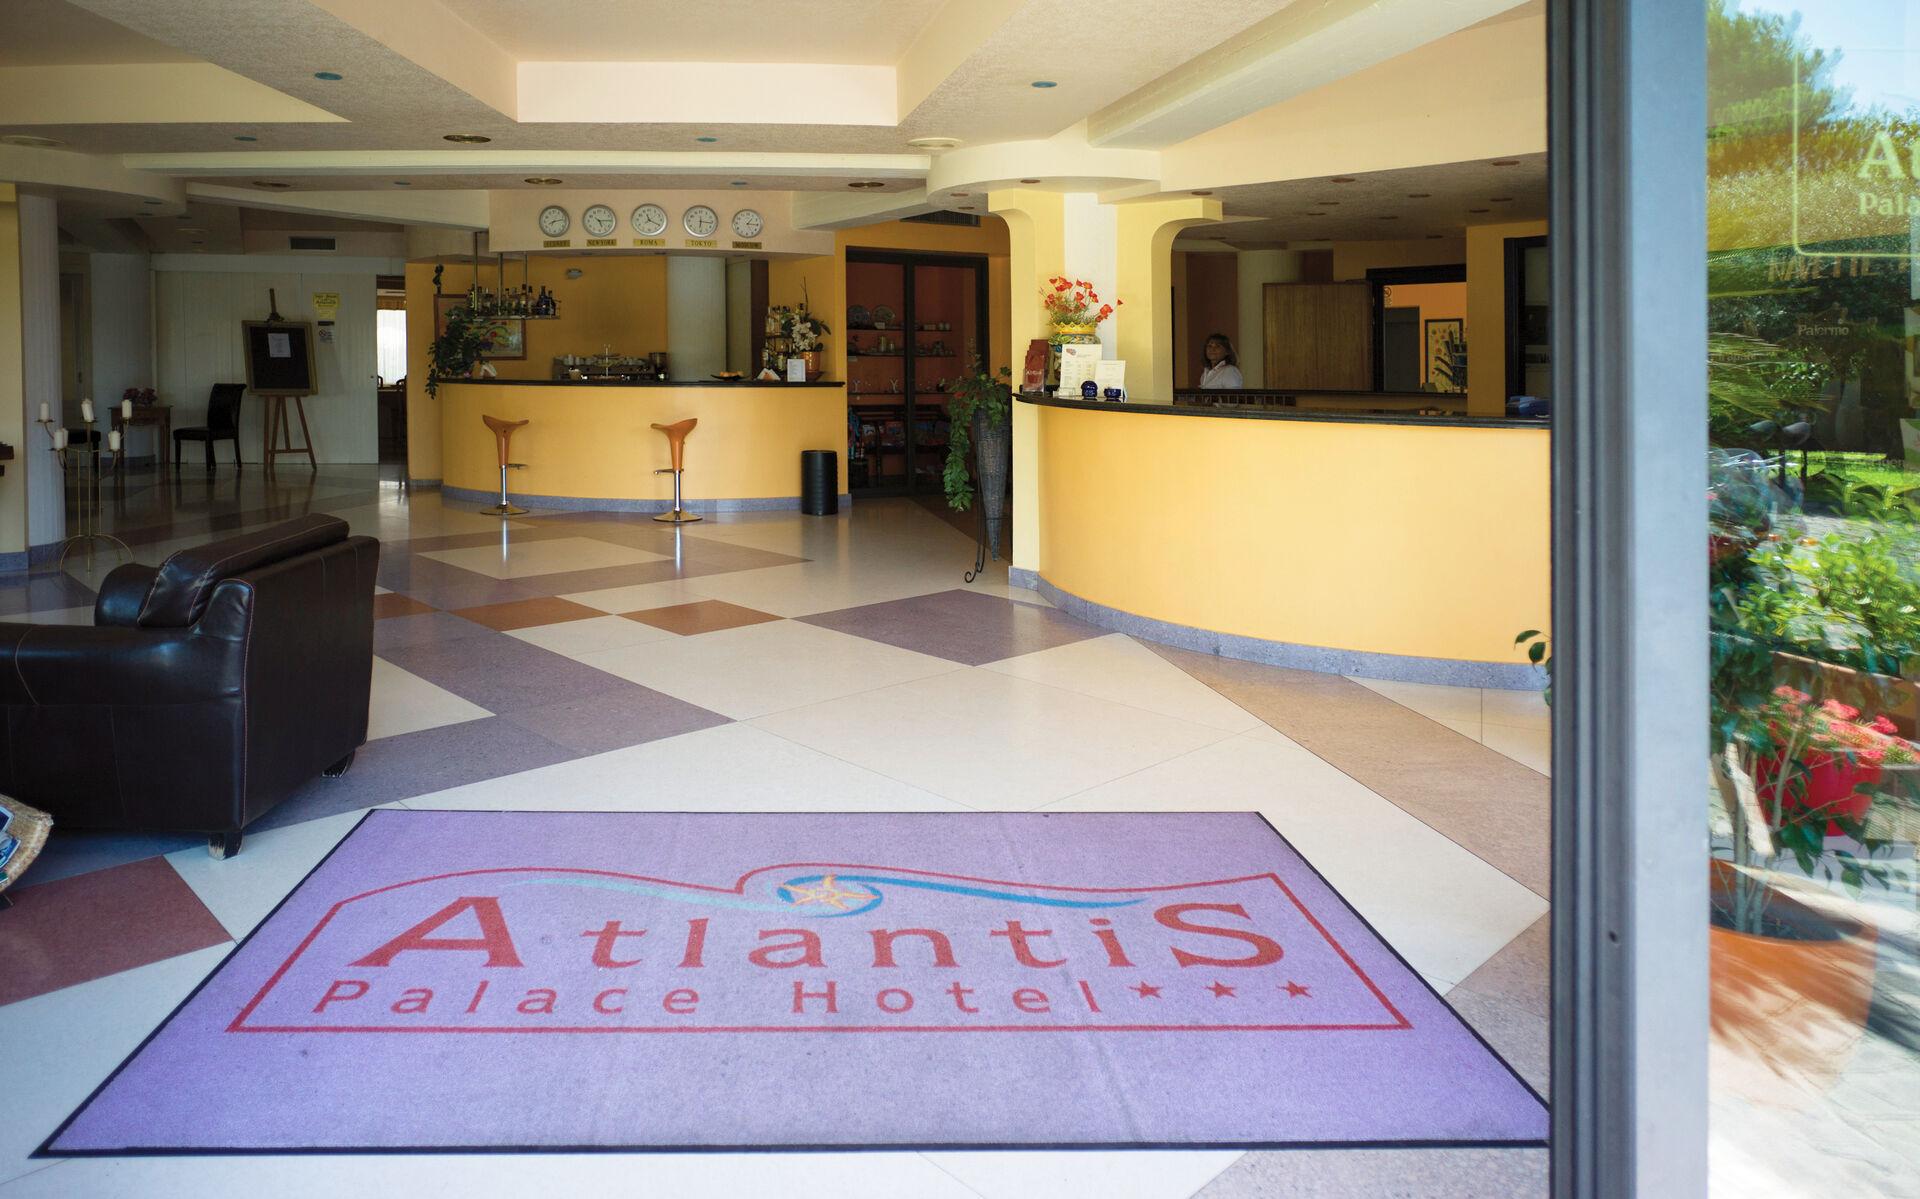 Italie - Sicile - Atlantis Palace Hôtel 3*